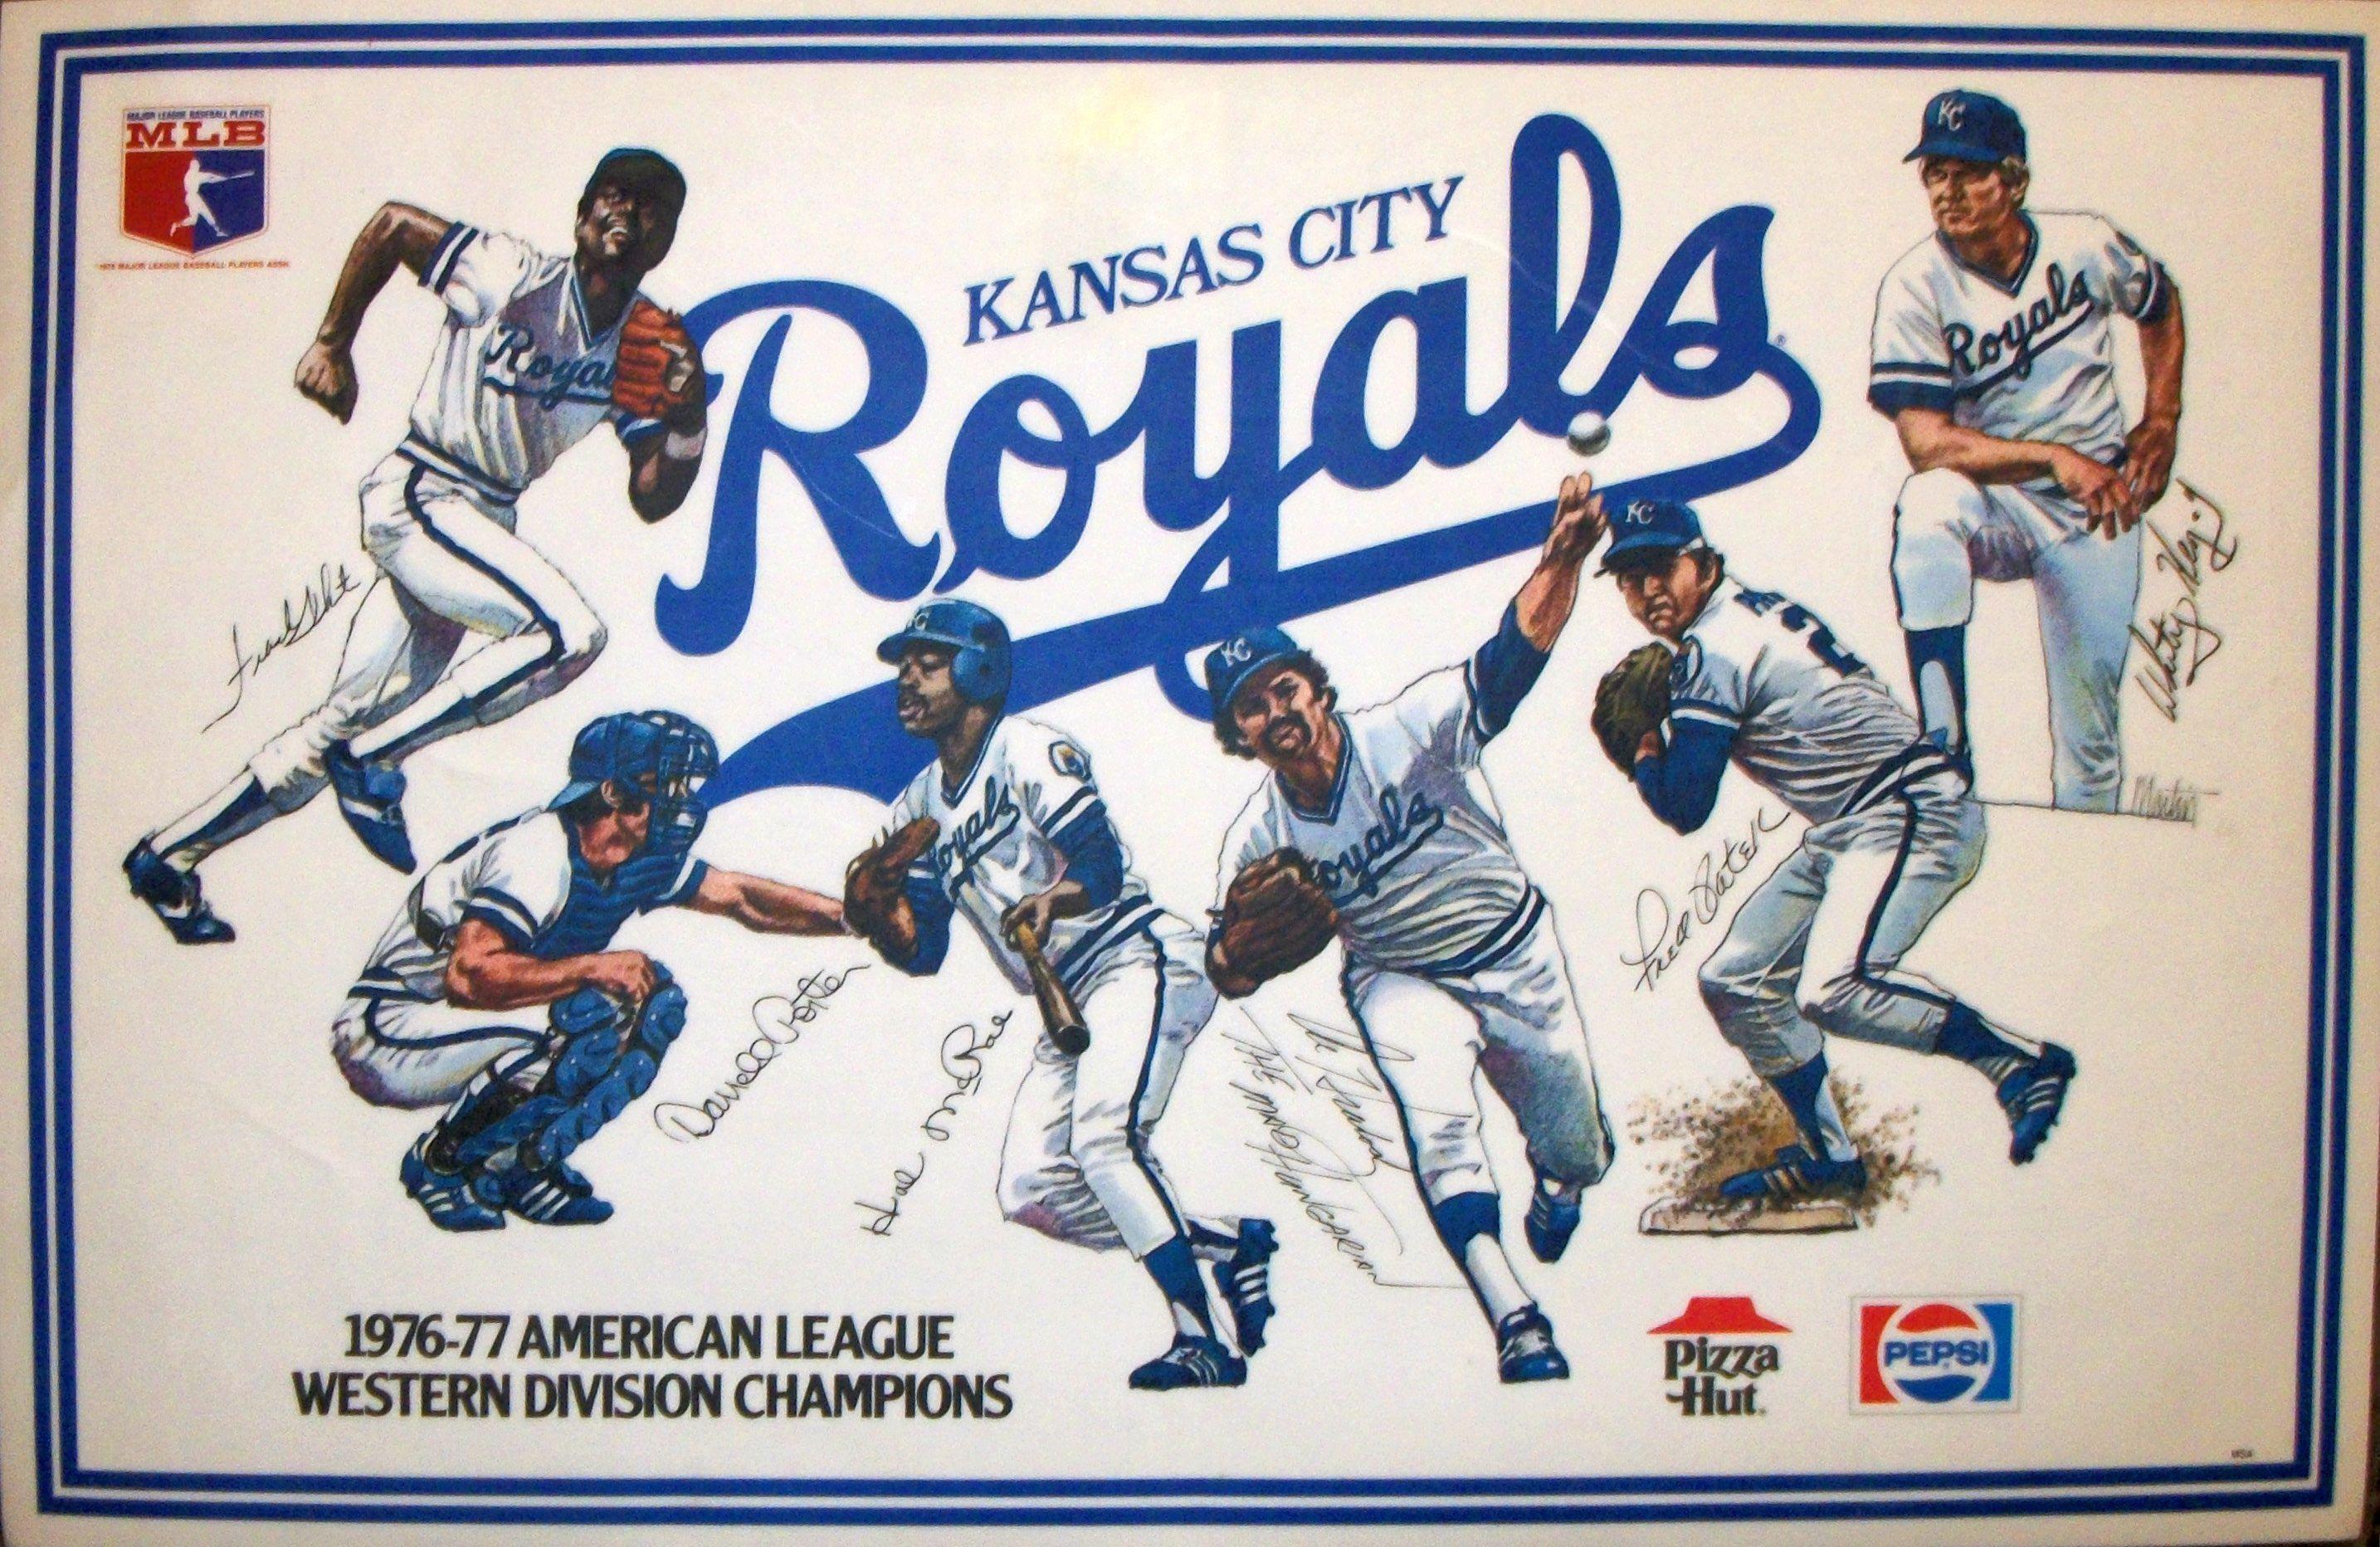 Kansas City Royals HD Wallpaper – WallpaperSafari